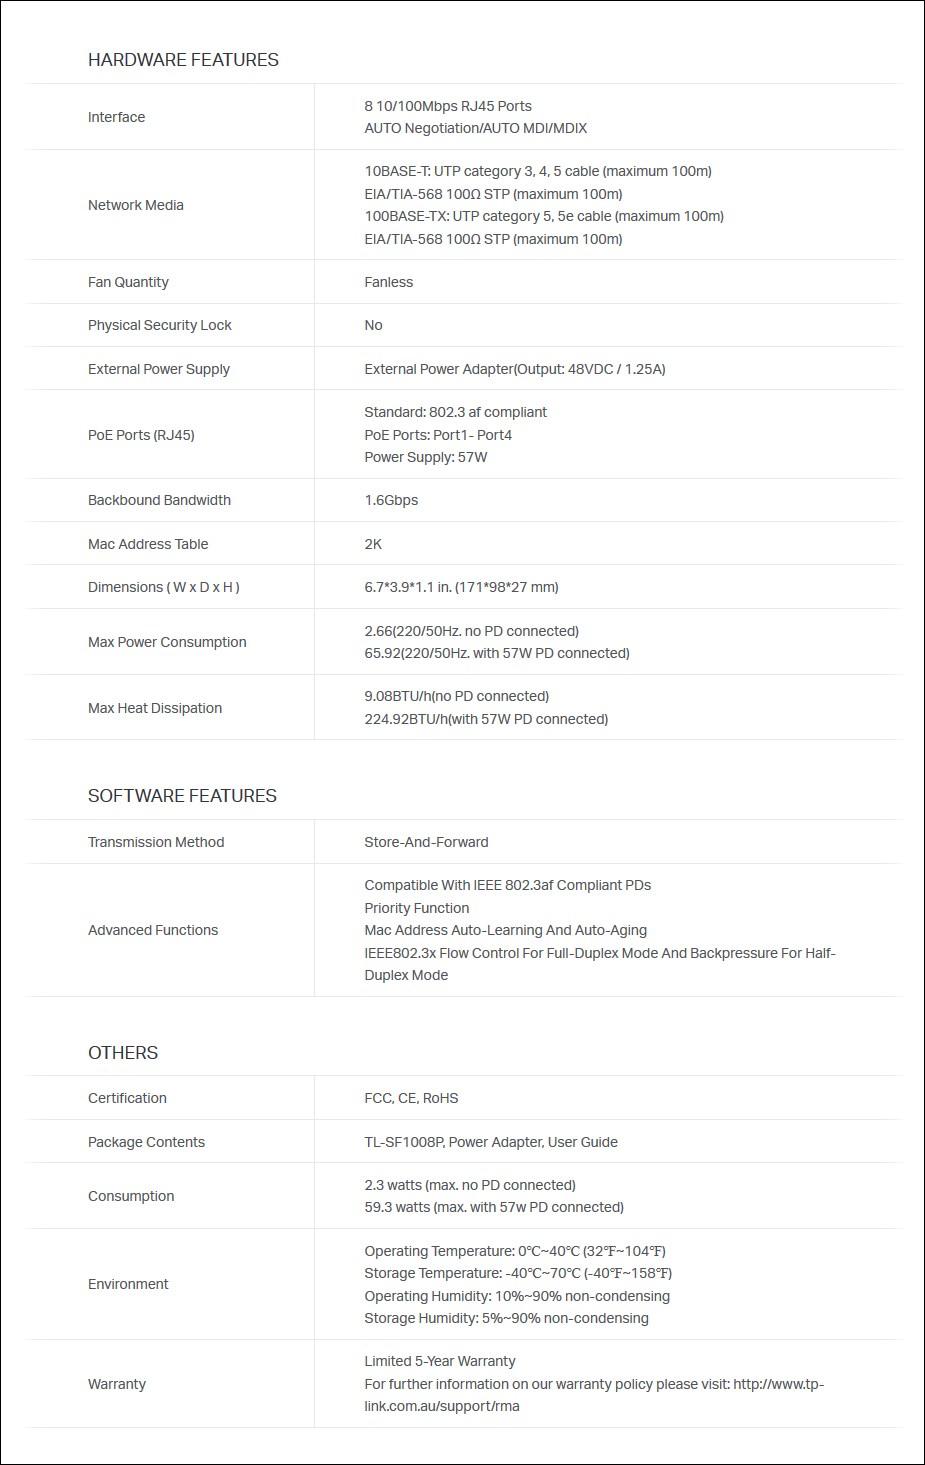 TP-Link TL-SF1008P 8 Port 10/100Mbps Desktop Switch With 4-Port POE - Overview 2